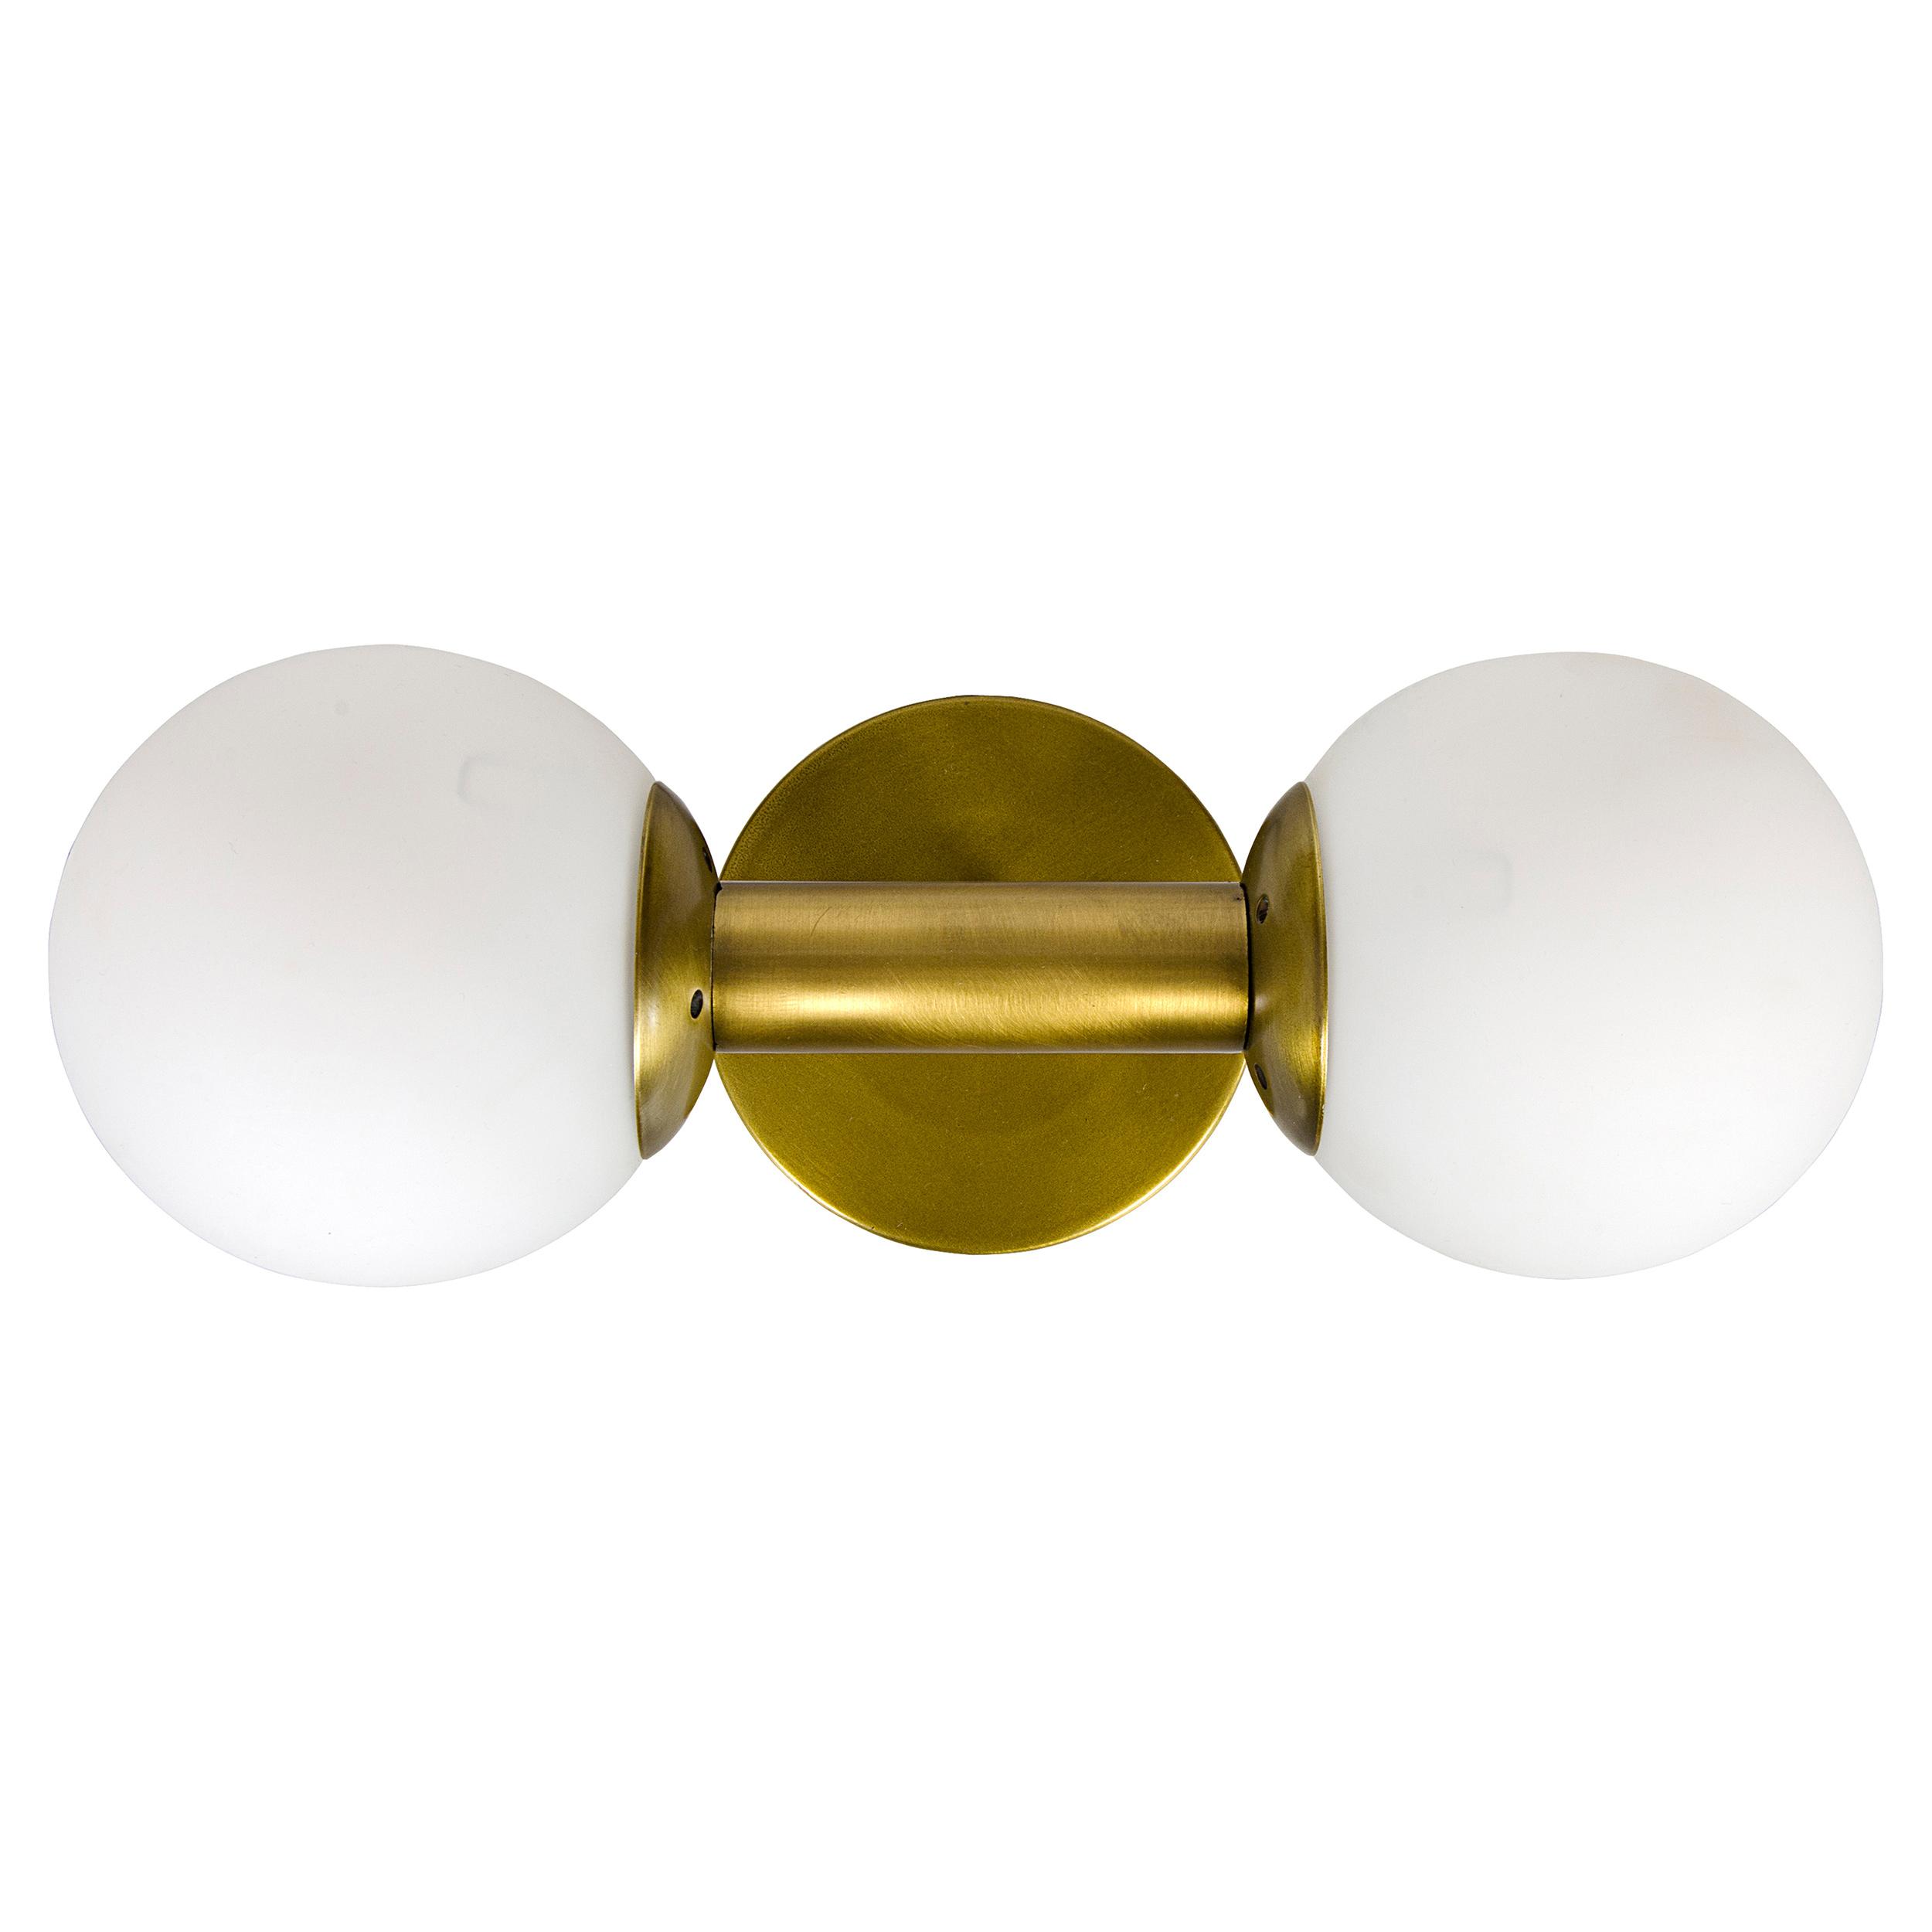 Latania Modern Classic Antique Brass Glass Globe Sconce